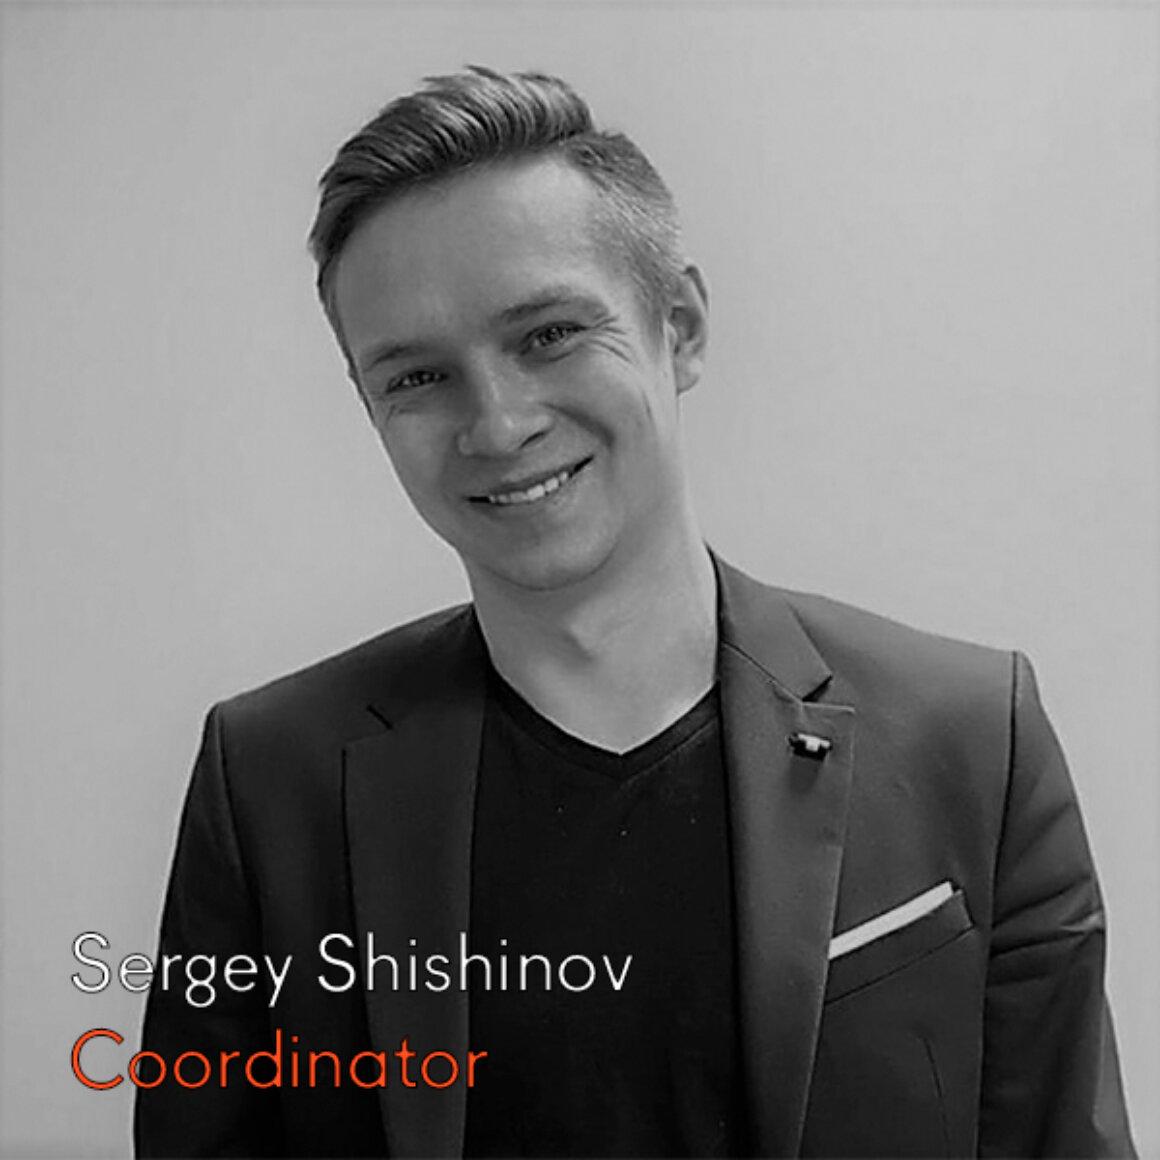 Sergey Shishinov